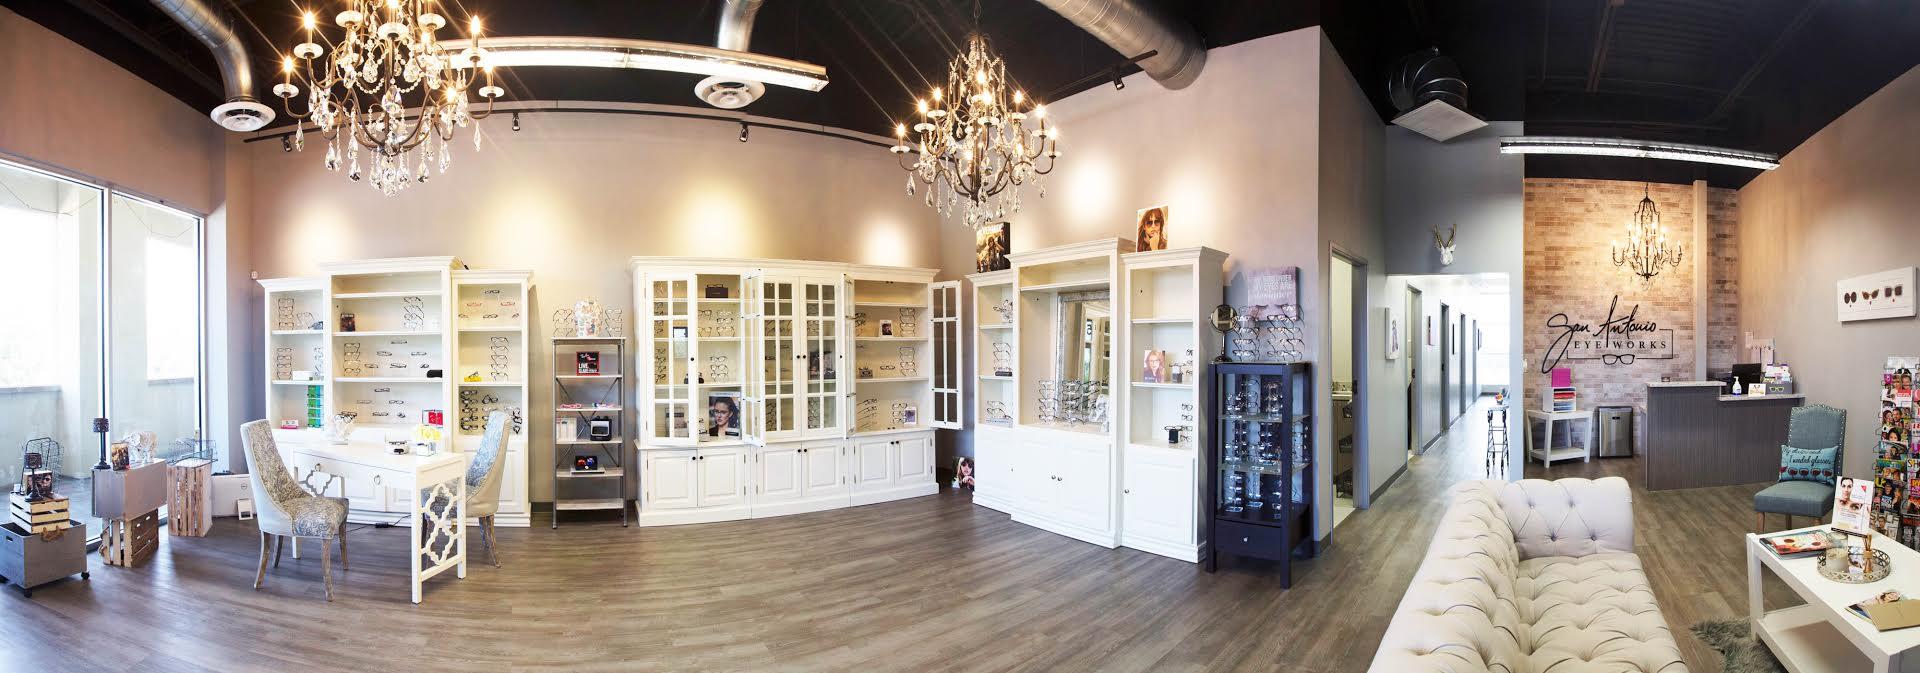 San Antonio Eyeworks Office